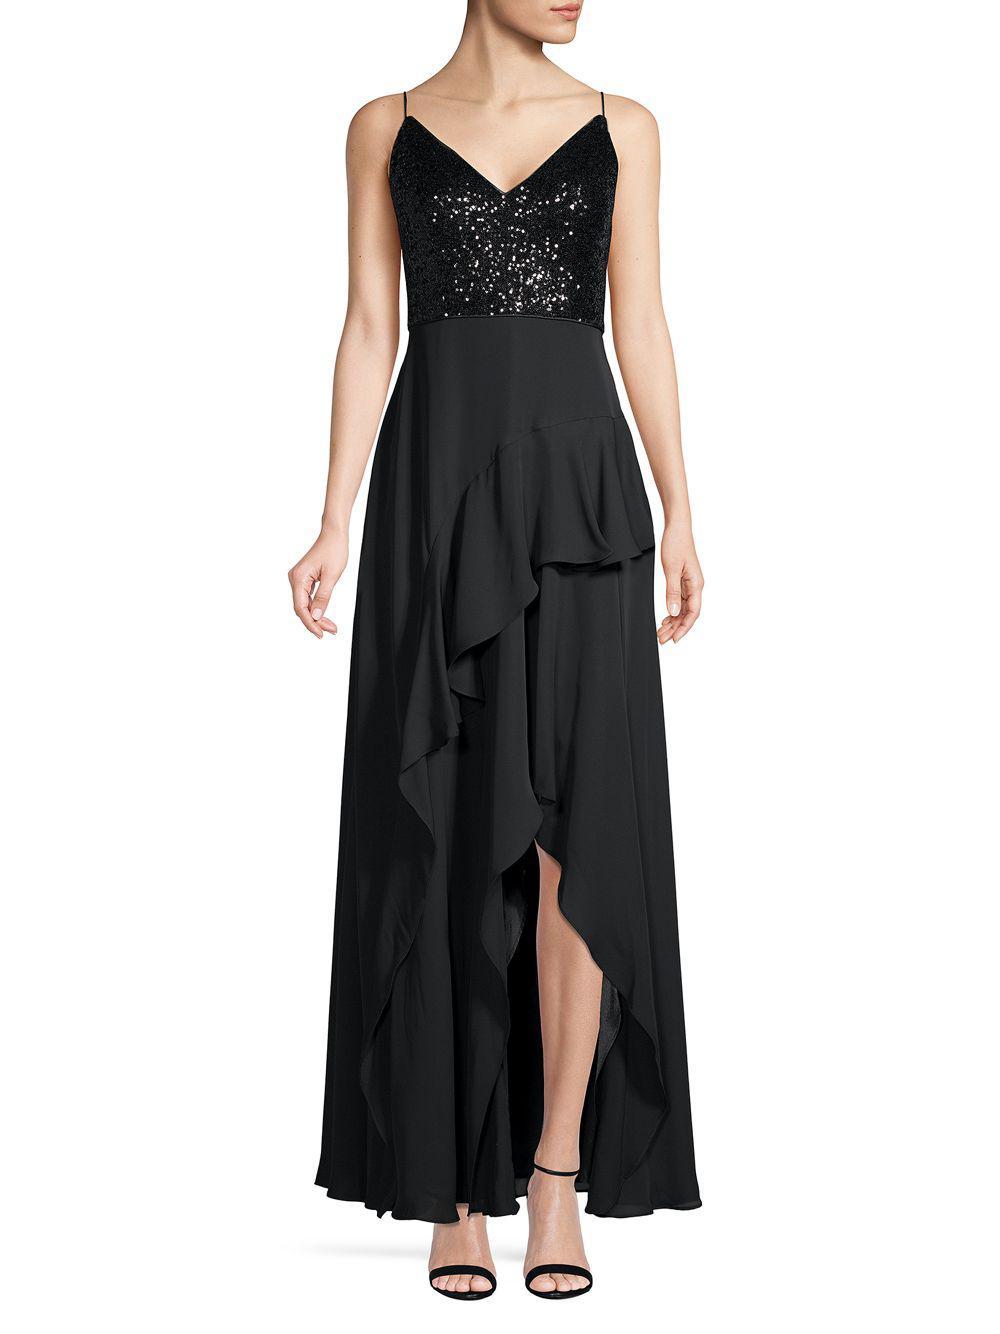 cc138e2f3f9d Calvin Klein Sequin & Chiffon Ruffle Slit Gown in Black - Save 36 ...